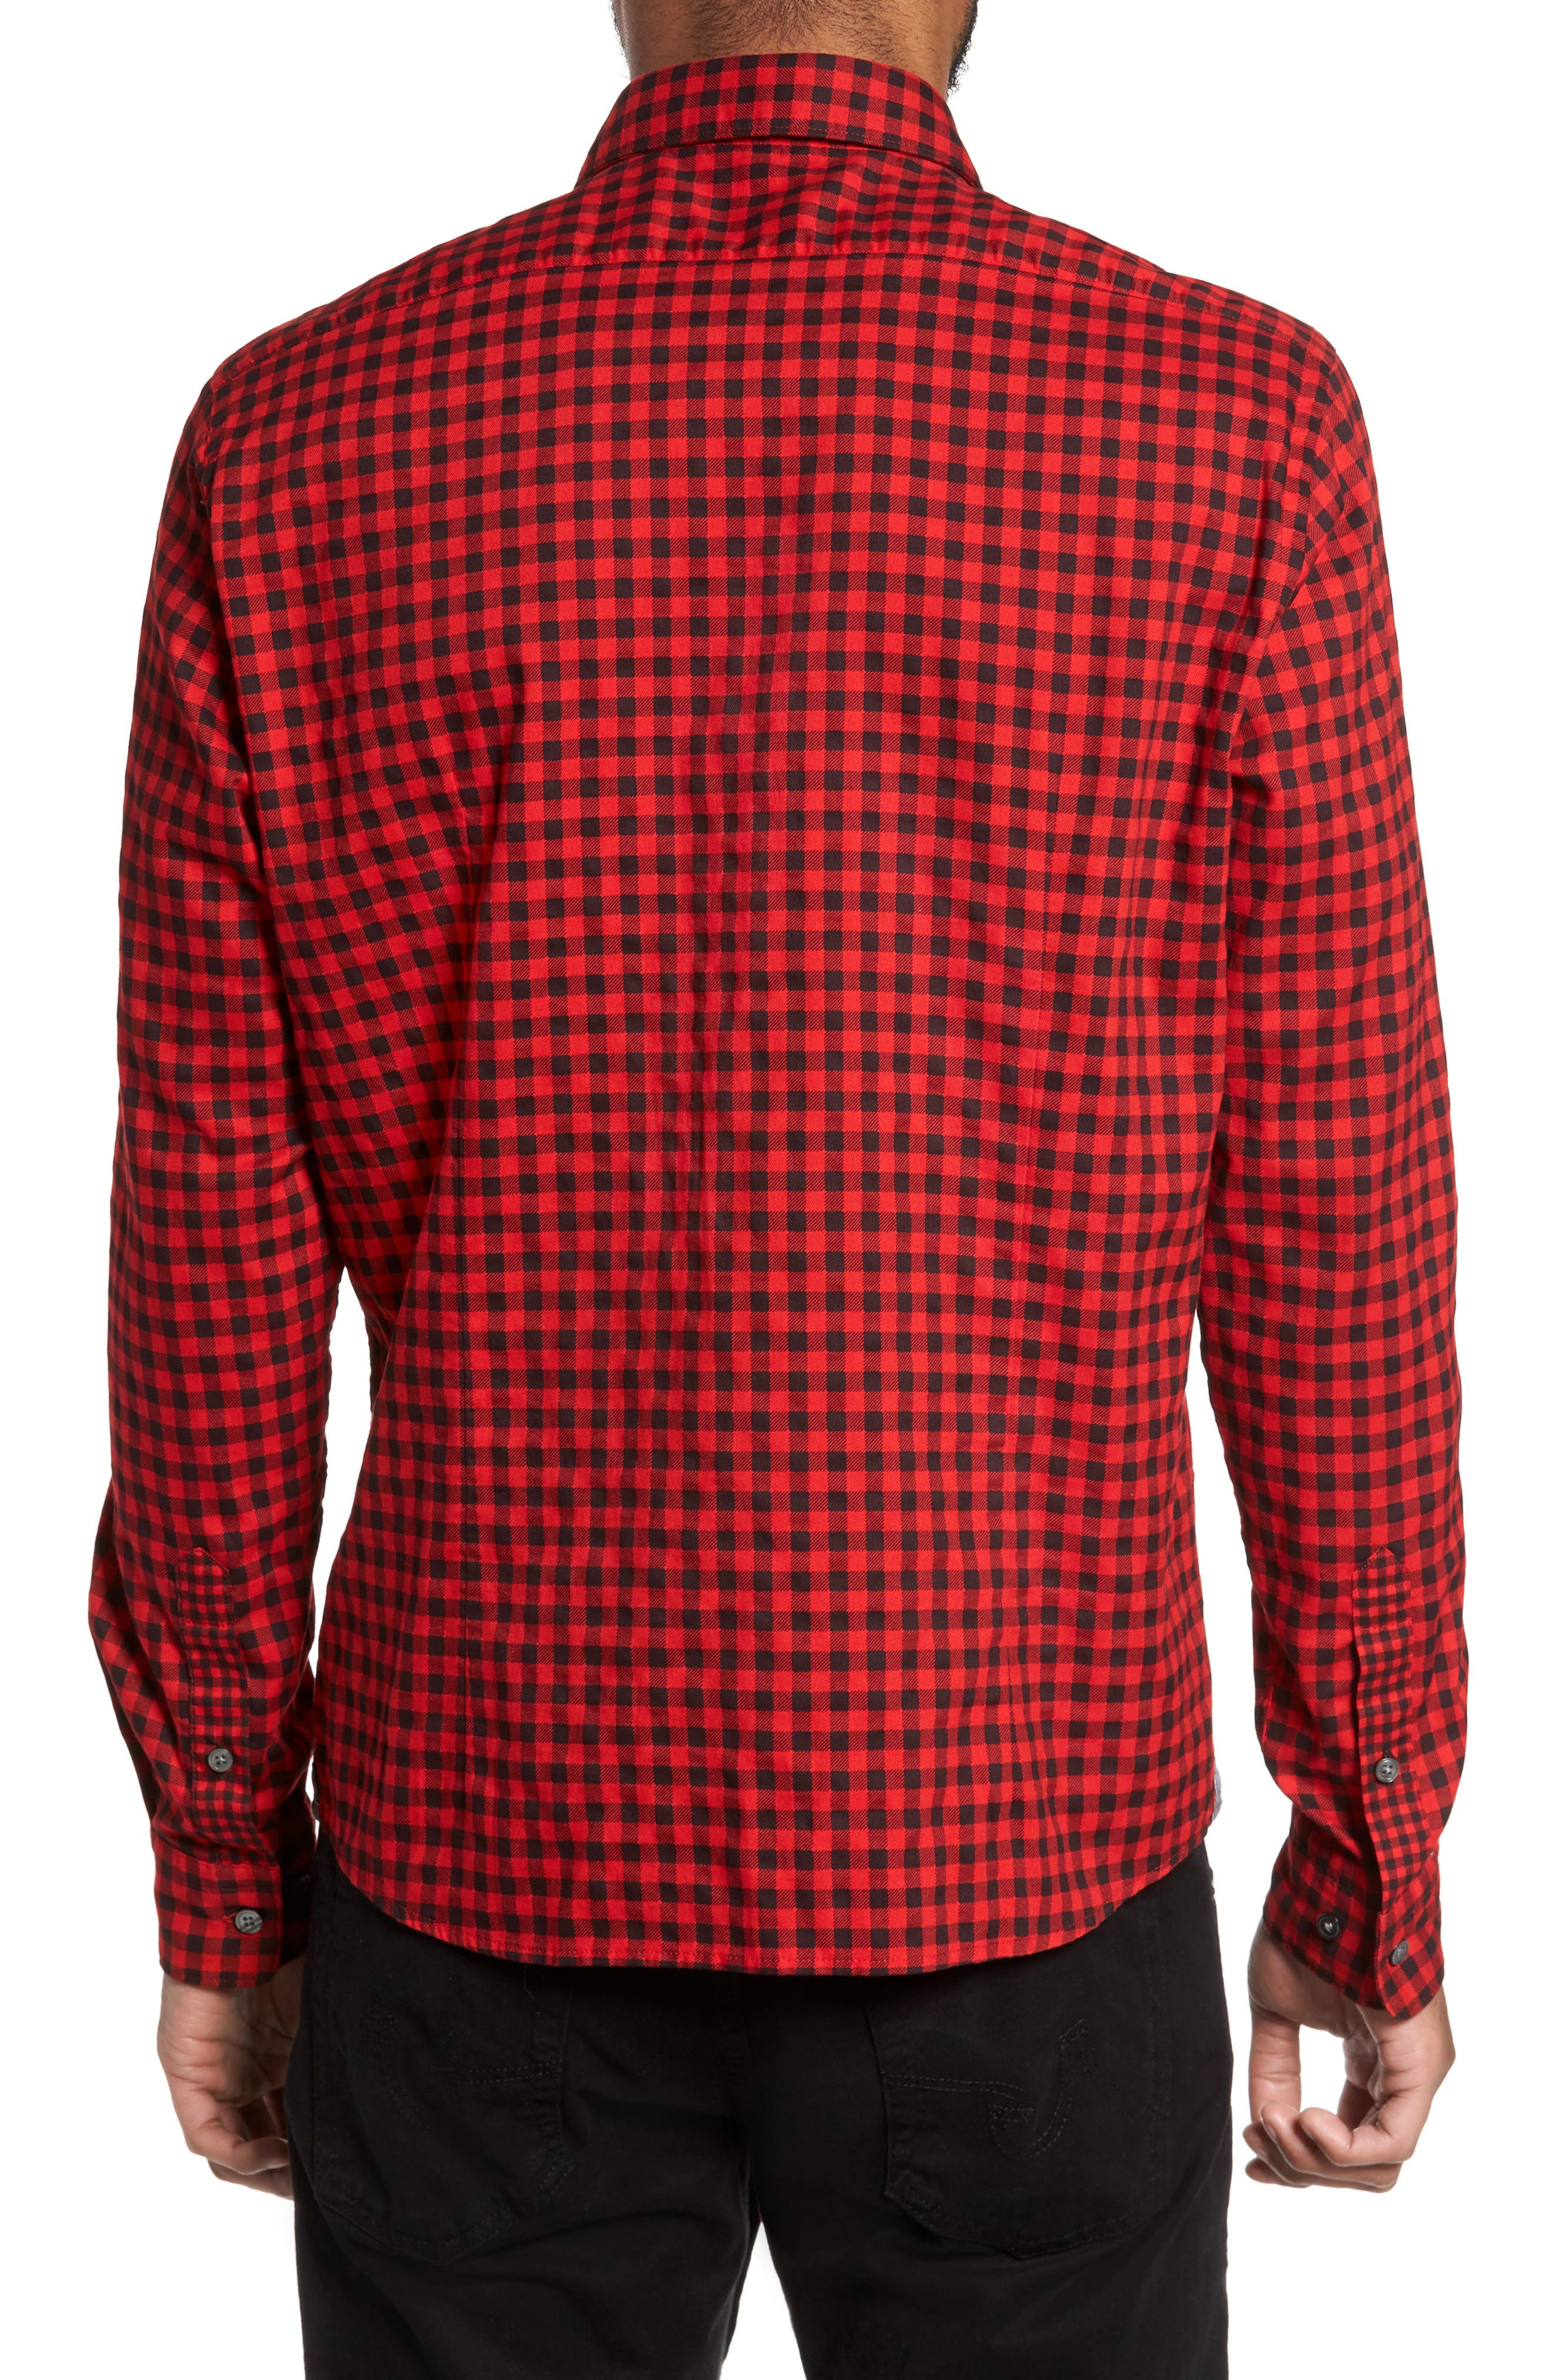 Lance Regular Fit Gingham Check Twill Sport Shirt,                             Alternate thumbnail 2, color,                             623